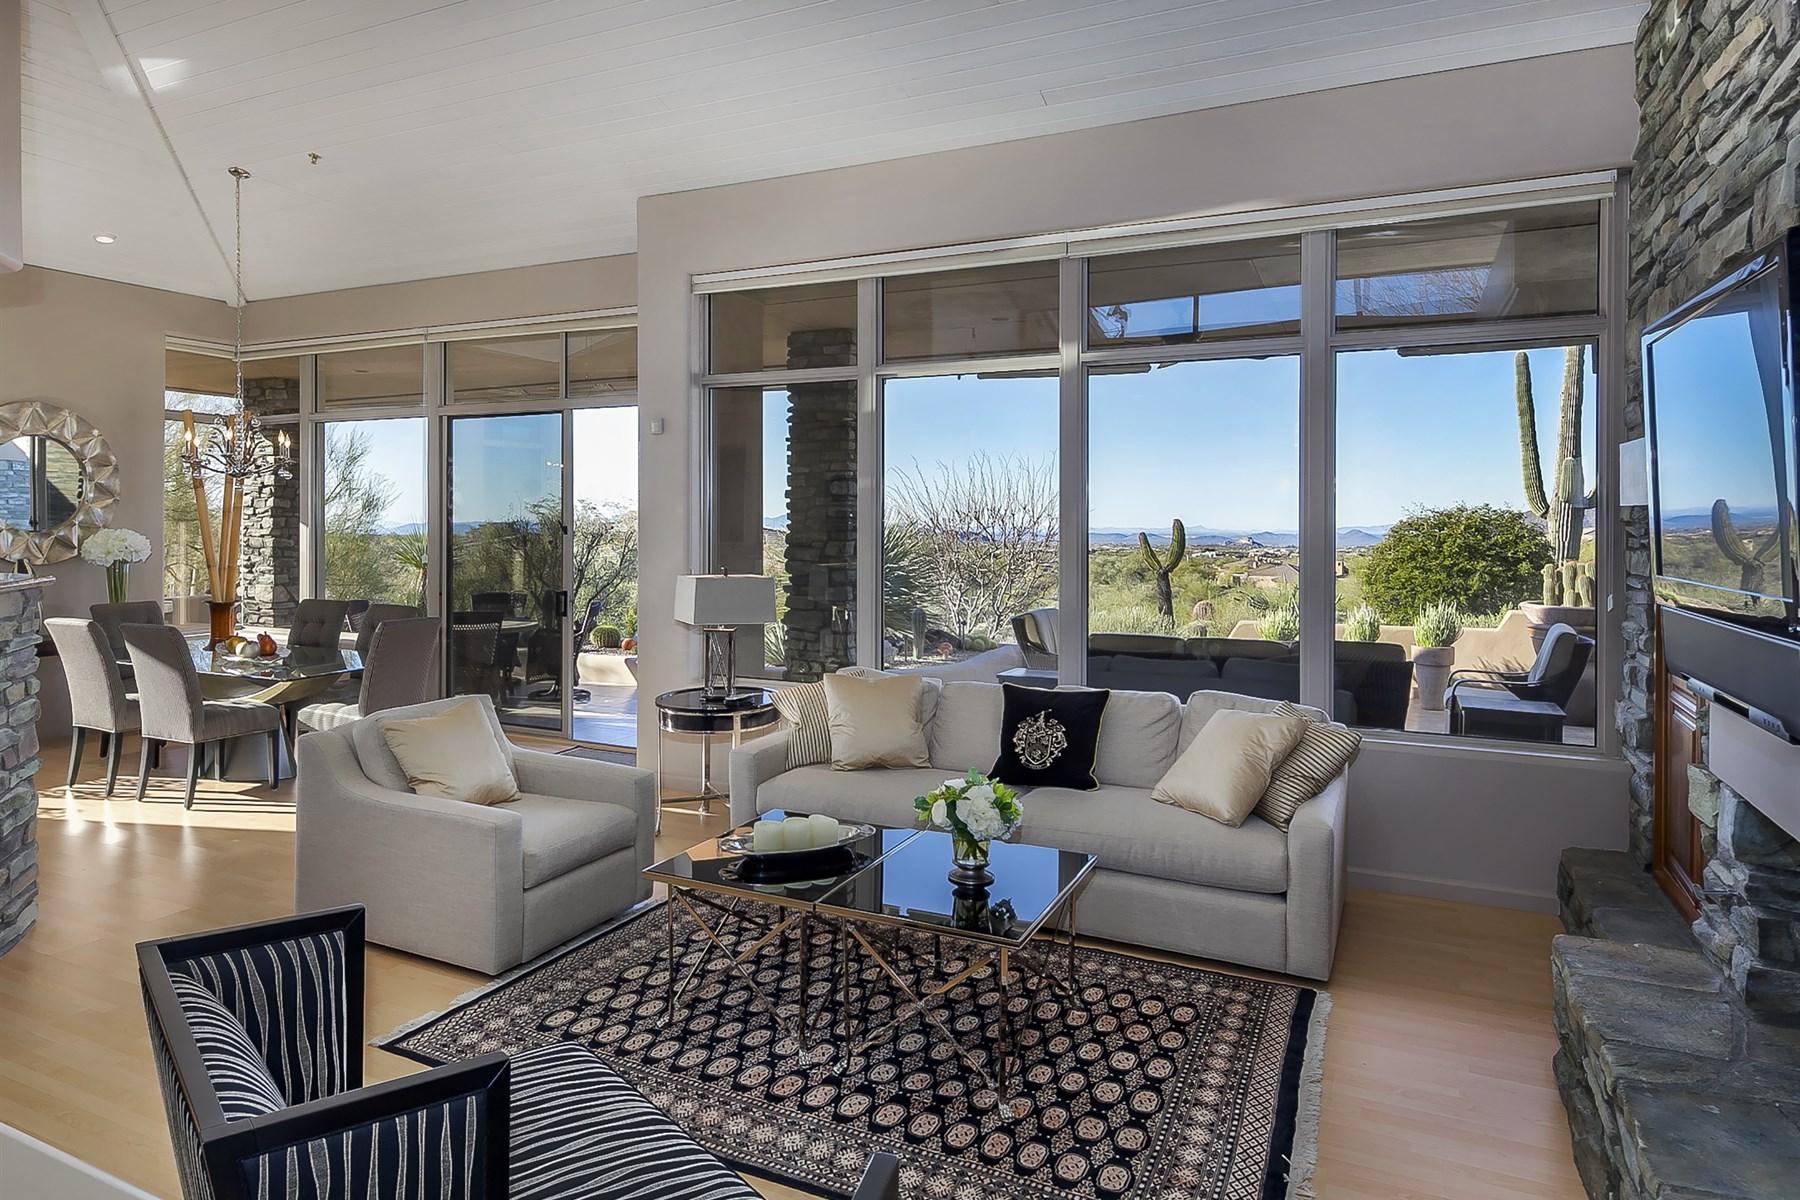 Таунхаус для того Продажа на Extraordinary remodeled Sonoran Ridge home 39018 N 101st Way Scottsdale, Аризона, 85262 Соединенные Штаты